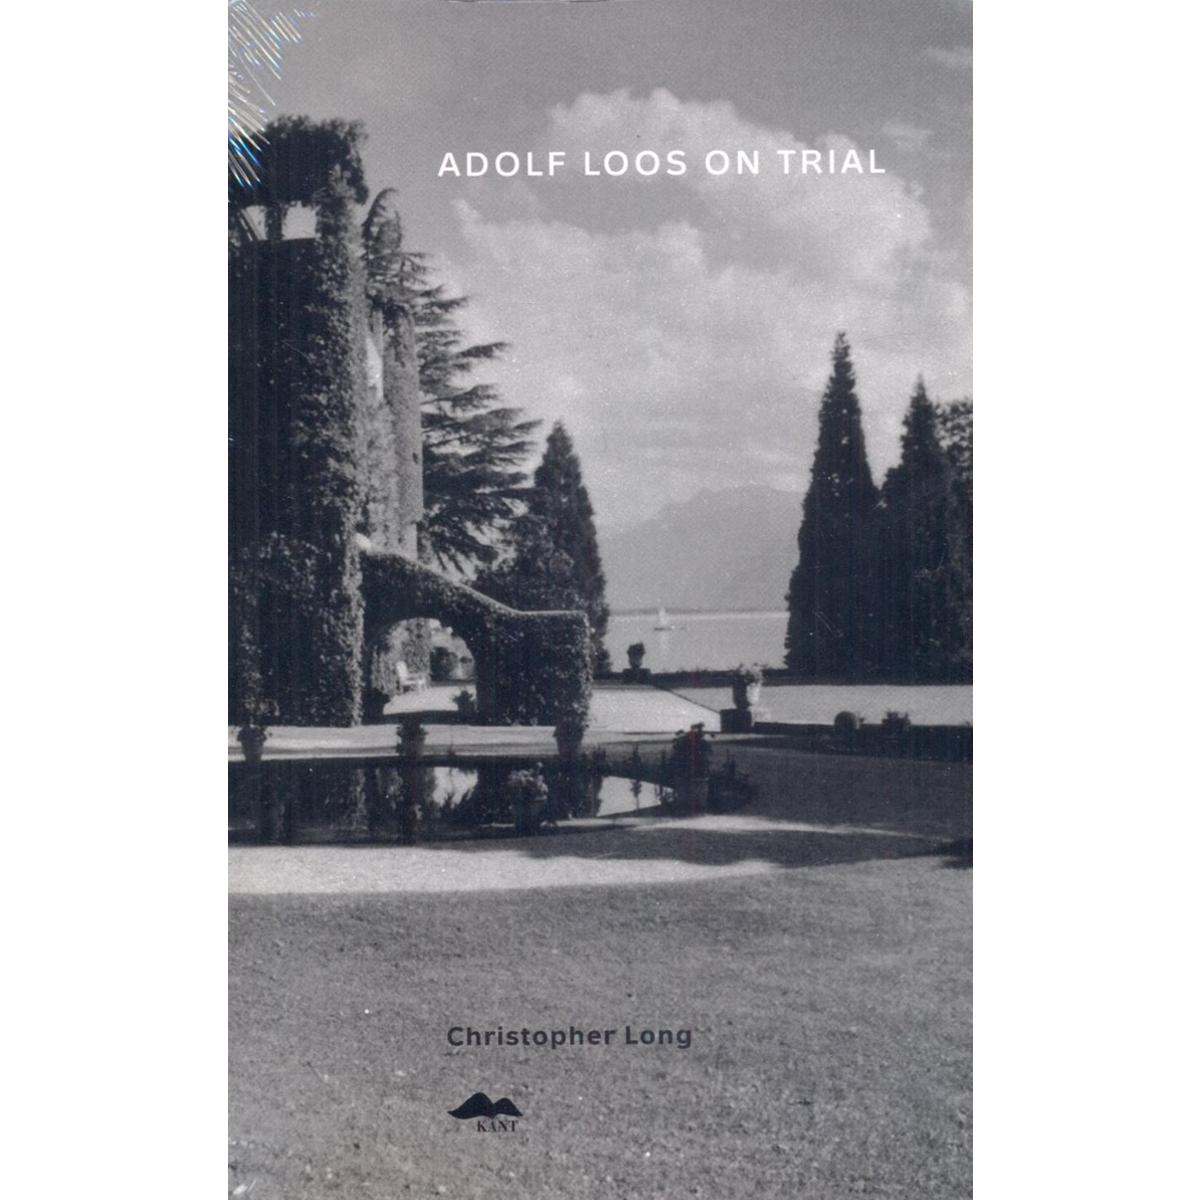 Adolf Loos on Trial